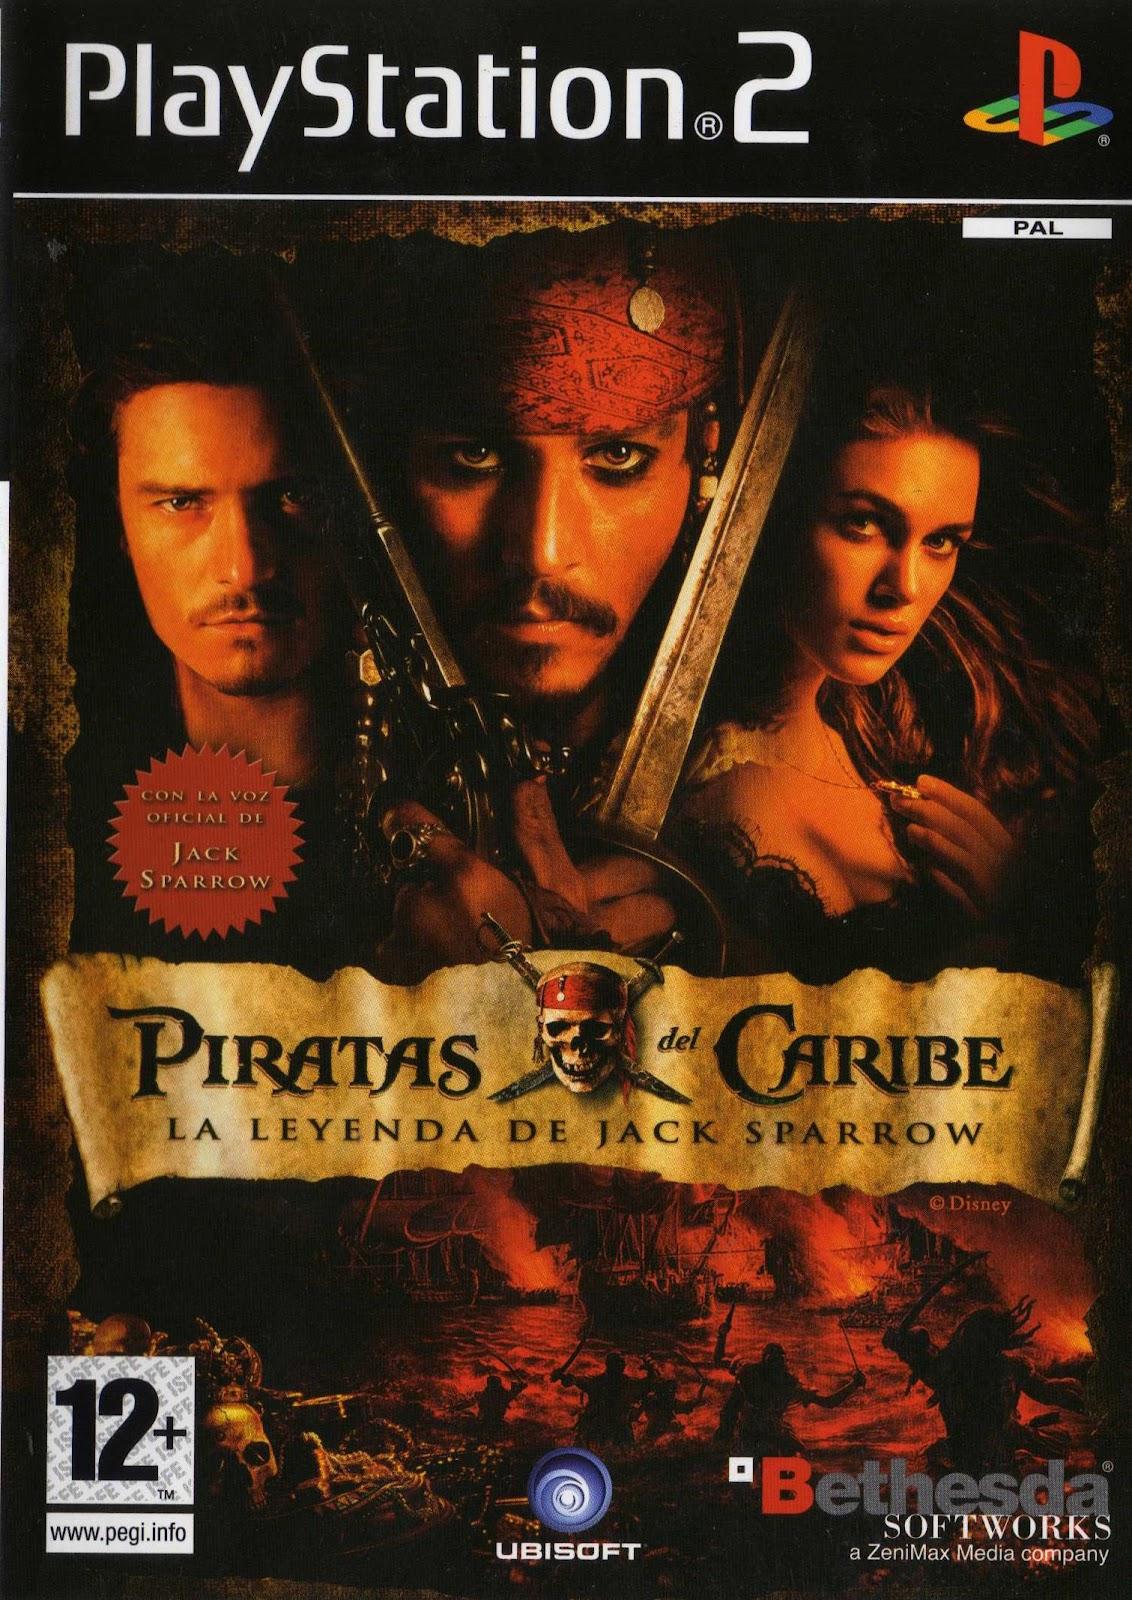 juegos piratas para ps2: